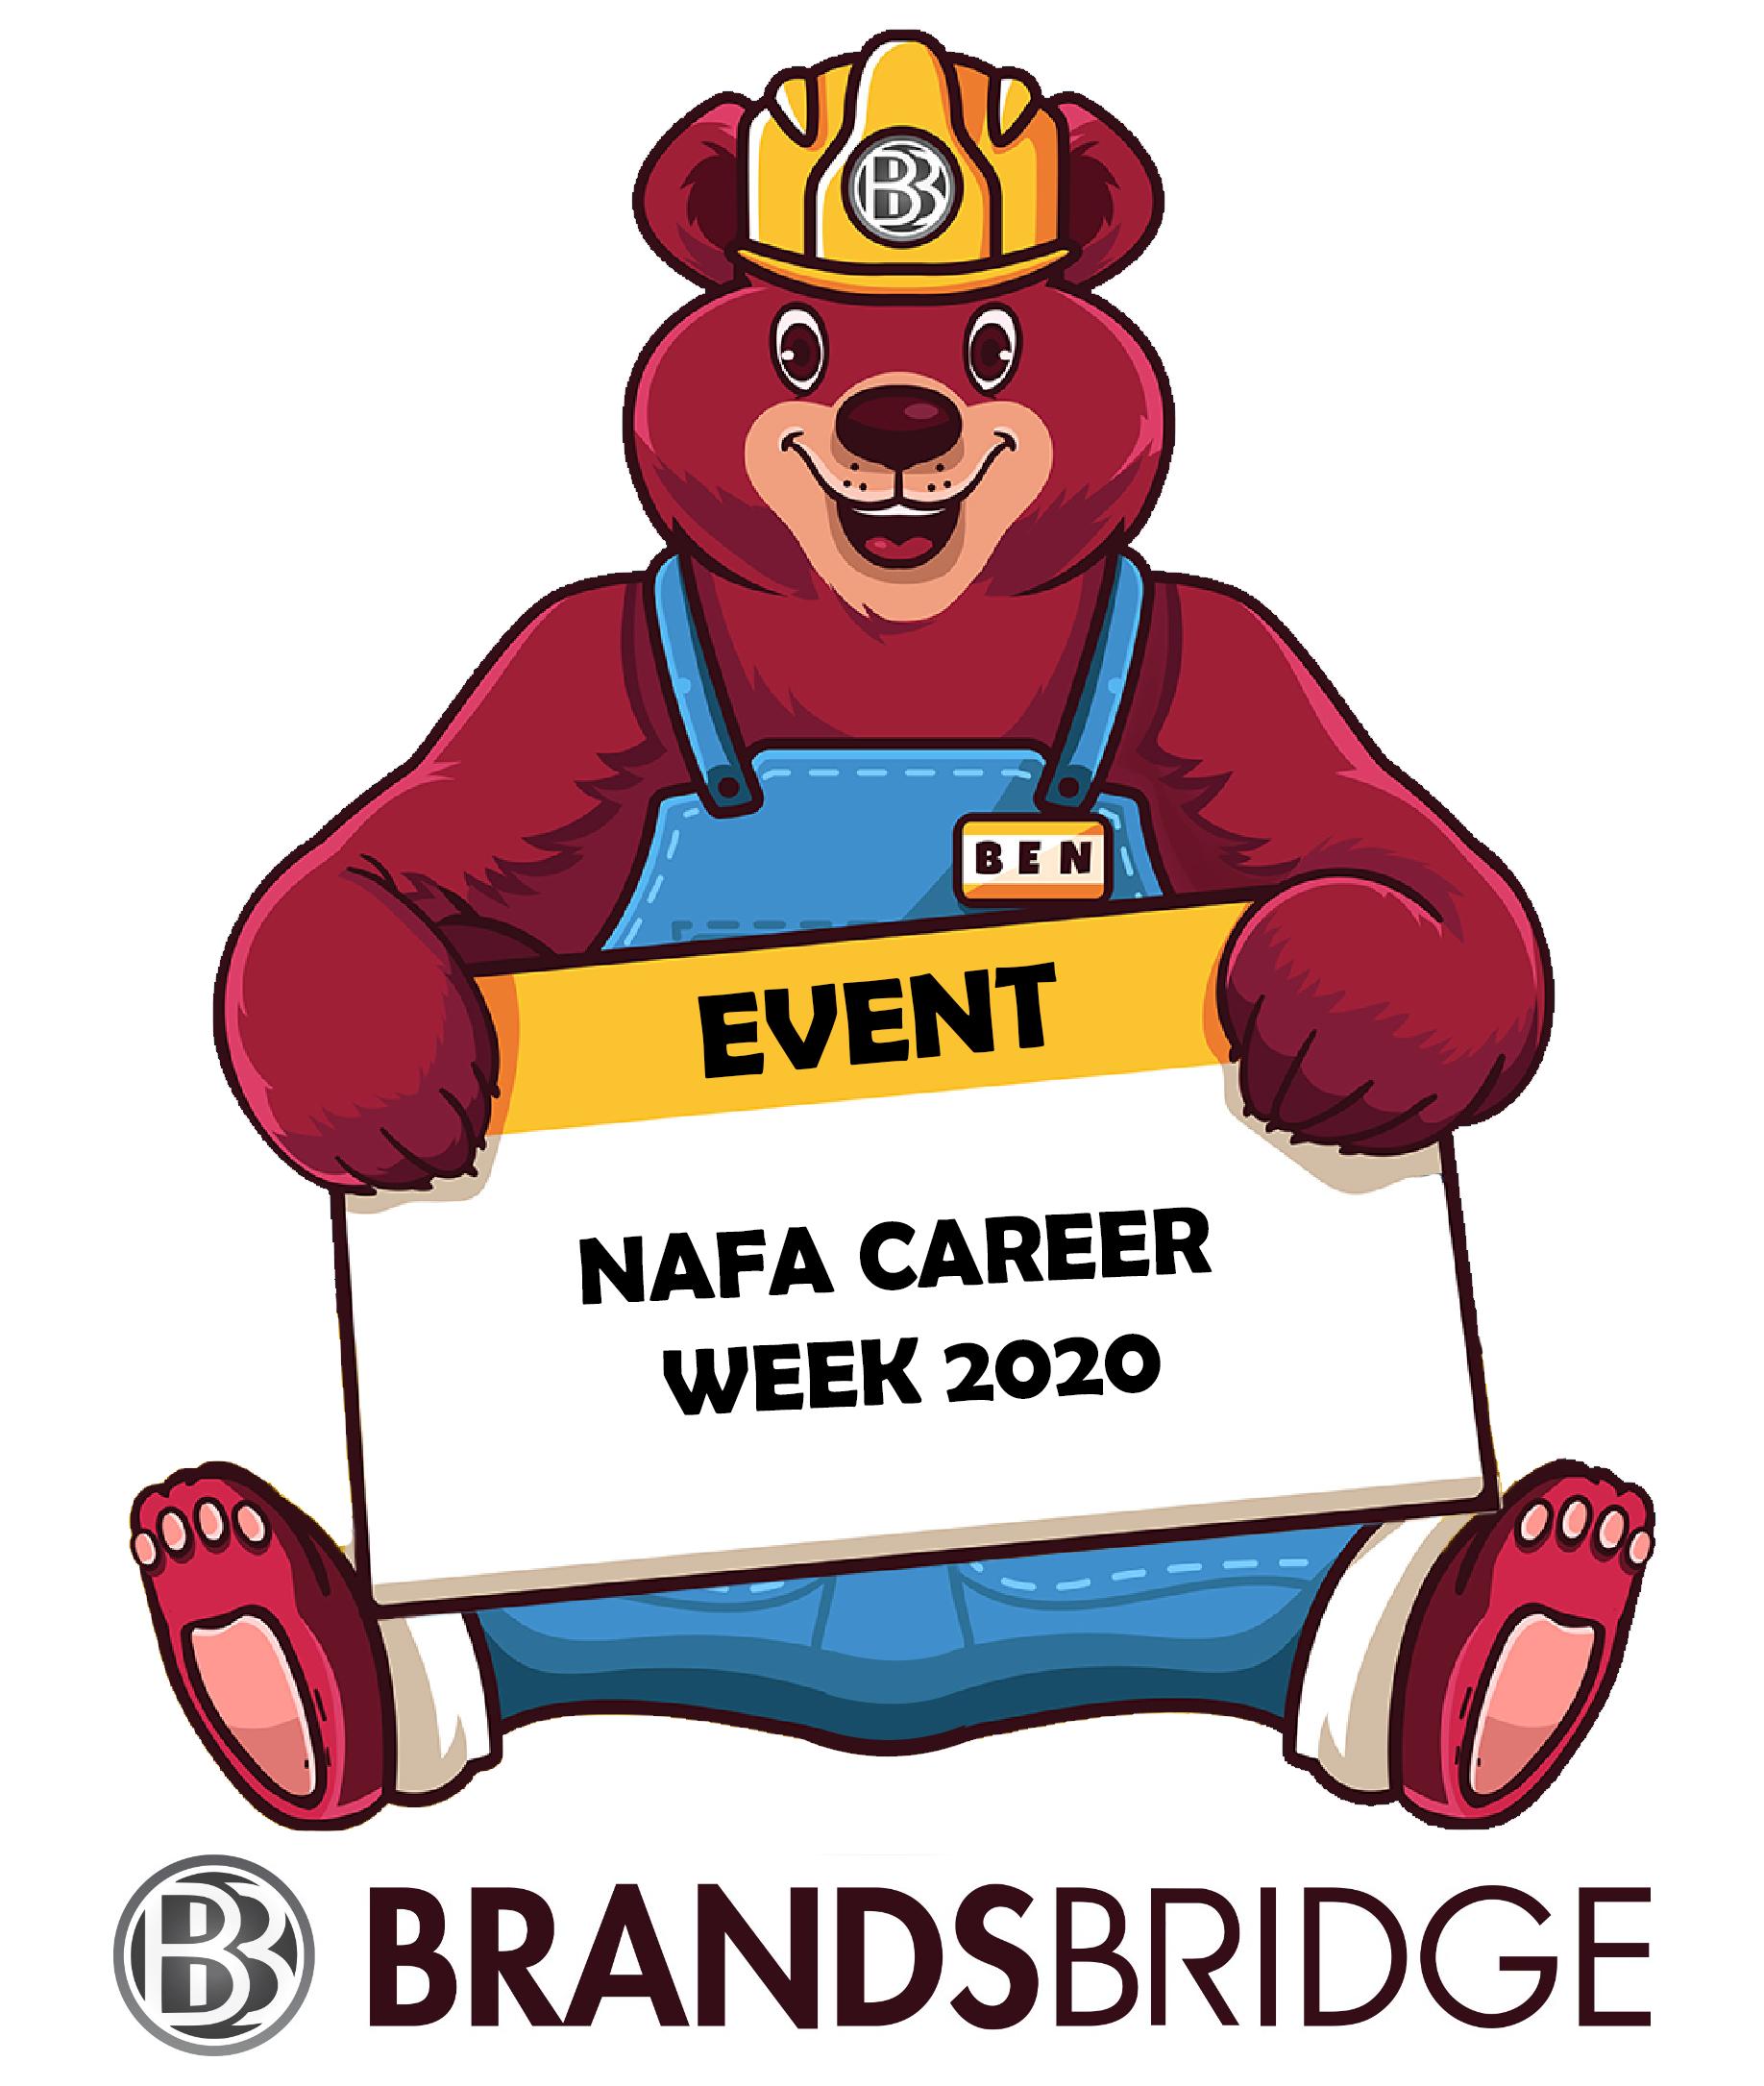 Ben Event Nafa Career Week 2020